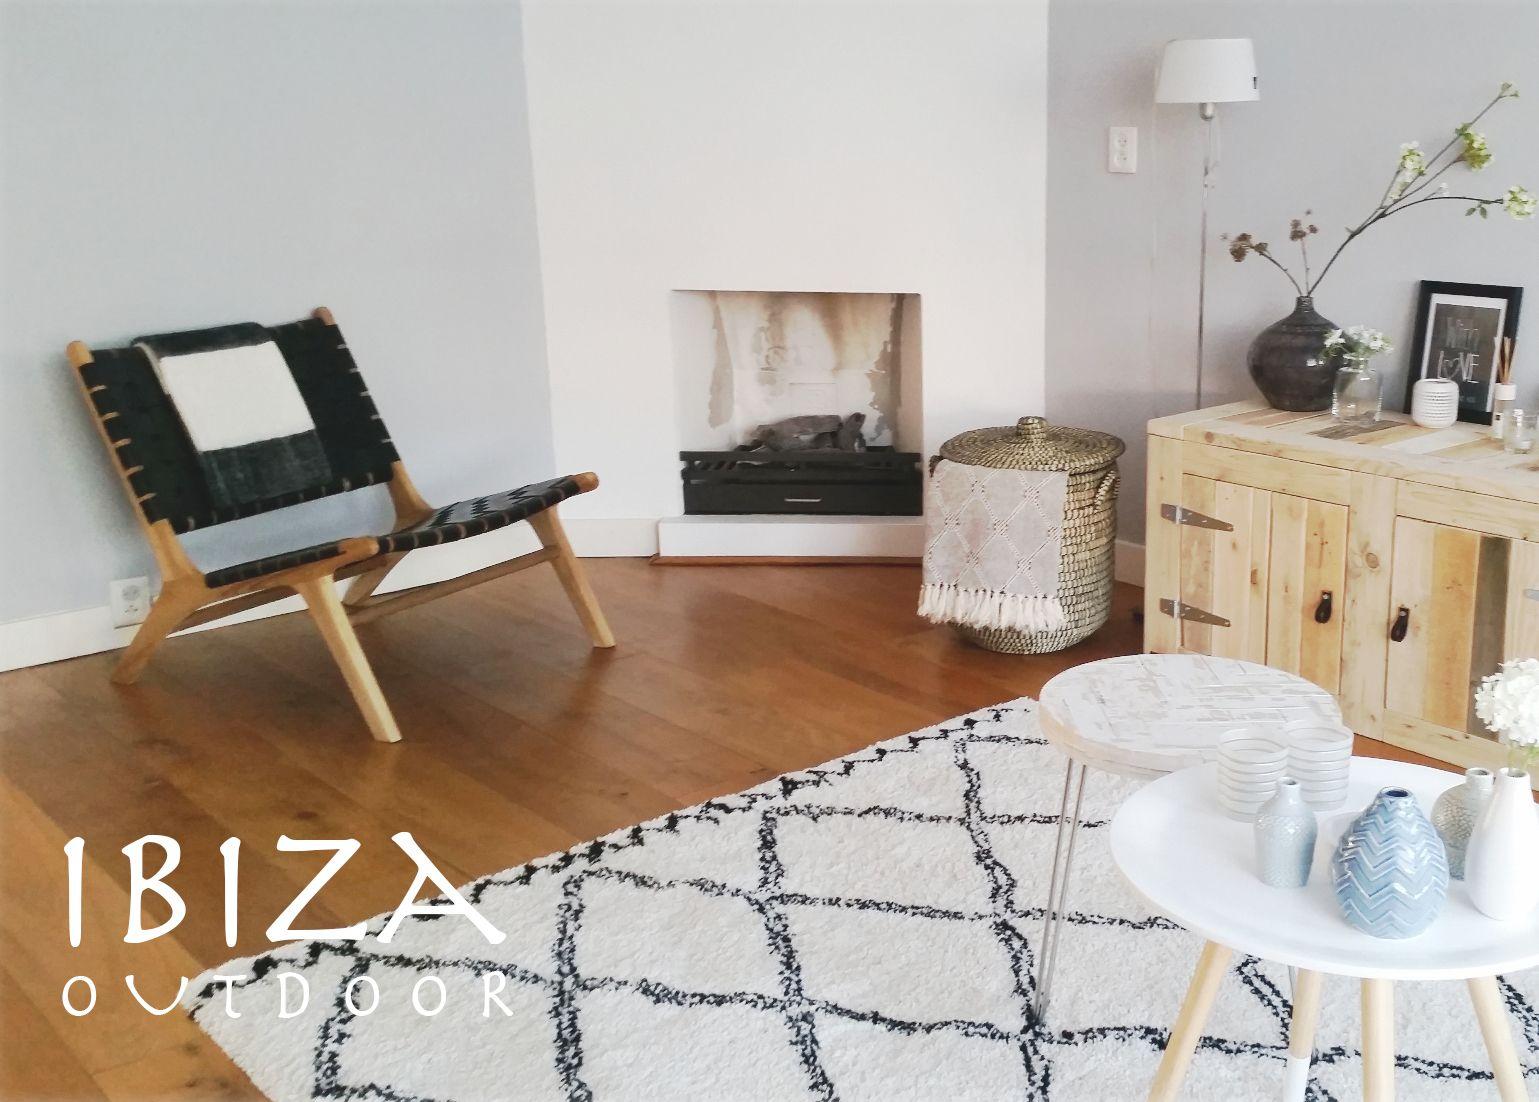 Mariele! dank voor je leuke foto met de Ushuaia vintage lounge stoel ...